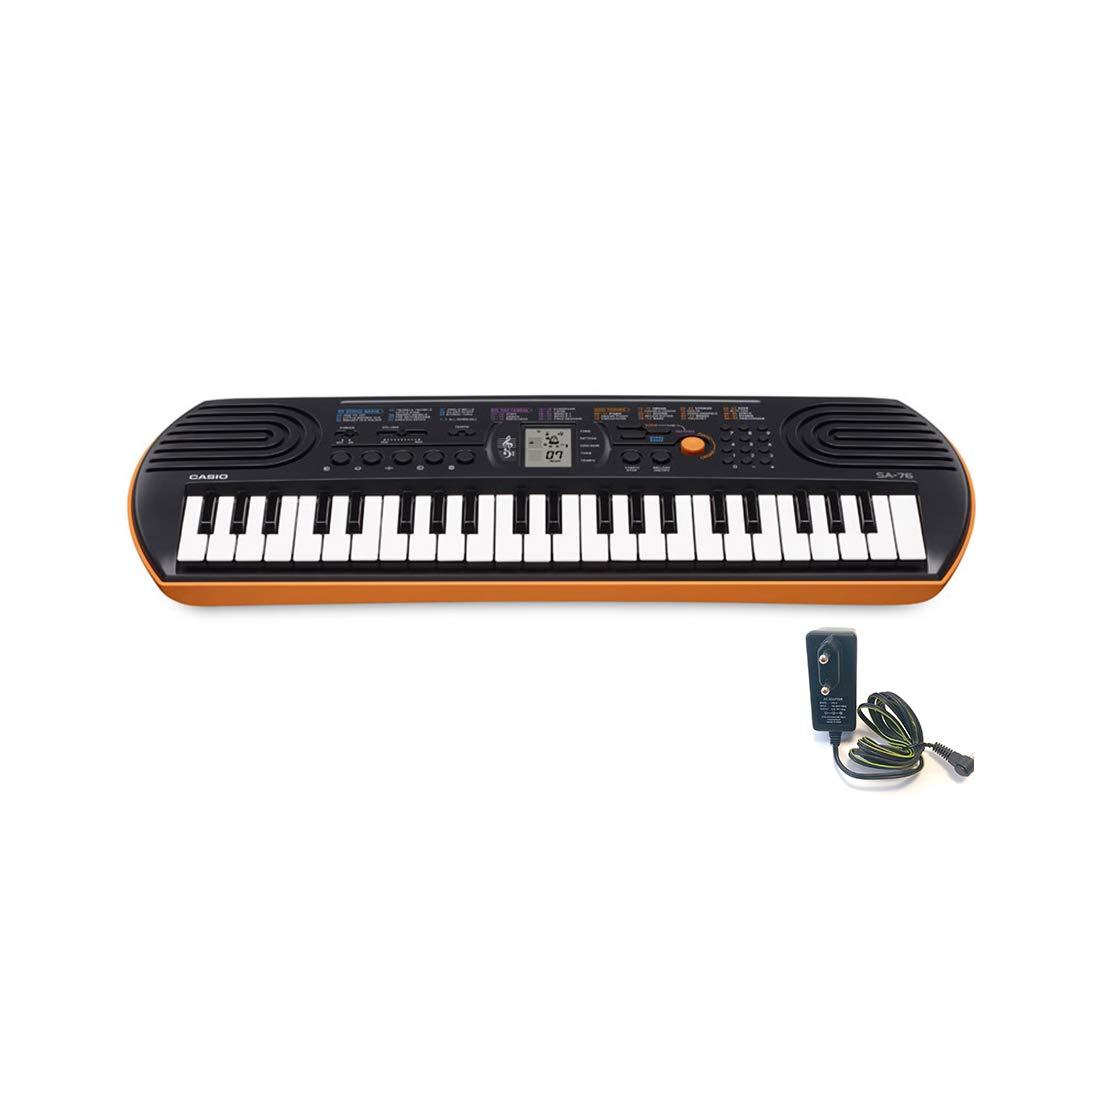 Tastiera a 44 tasti Casio SA-76H2